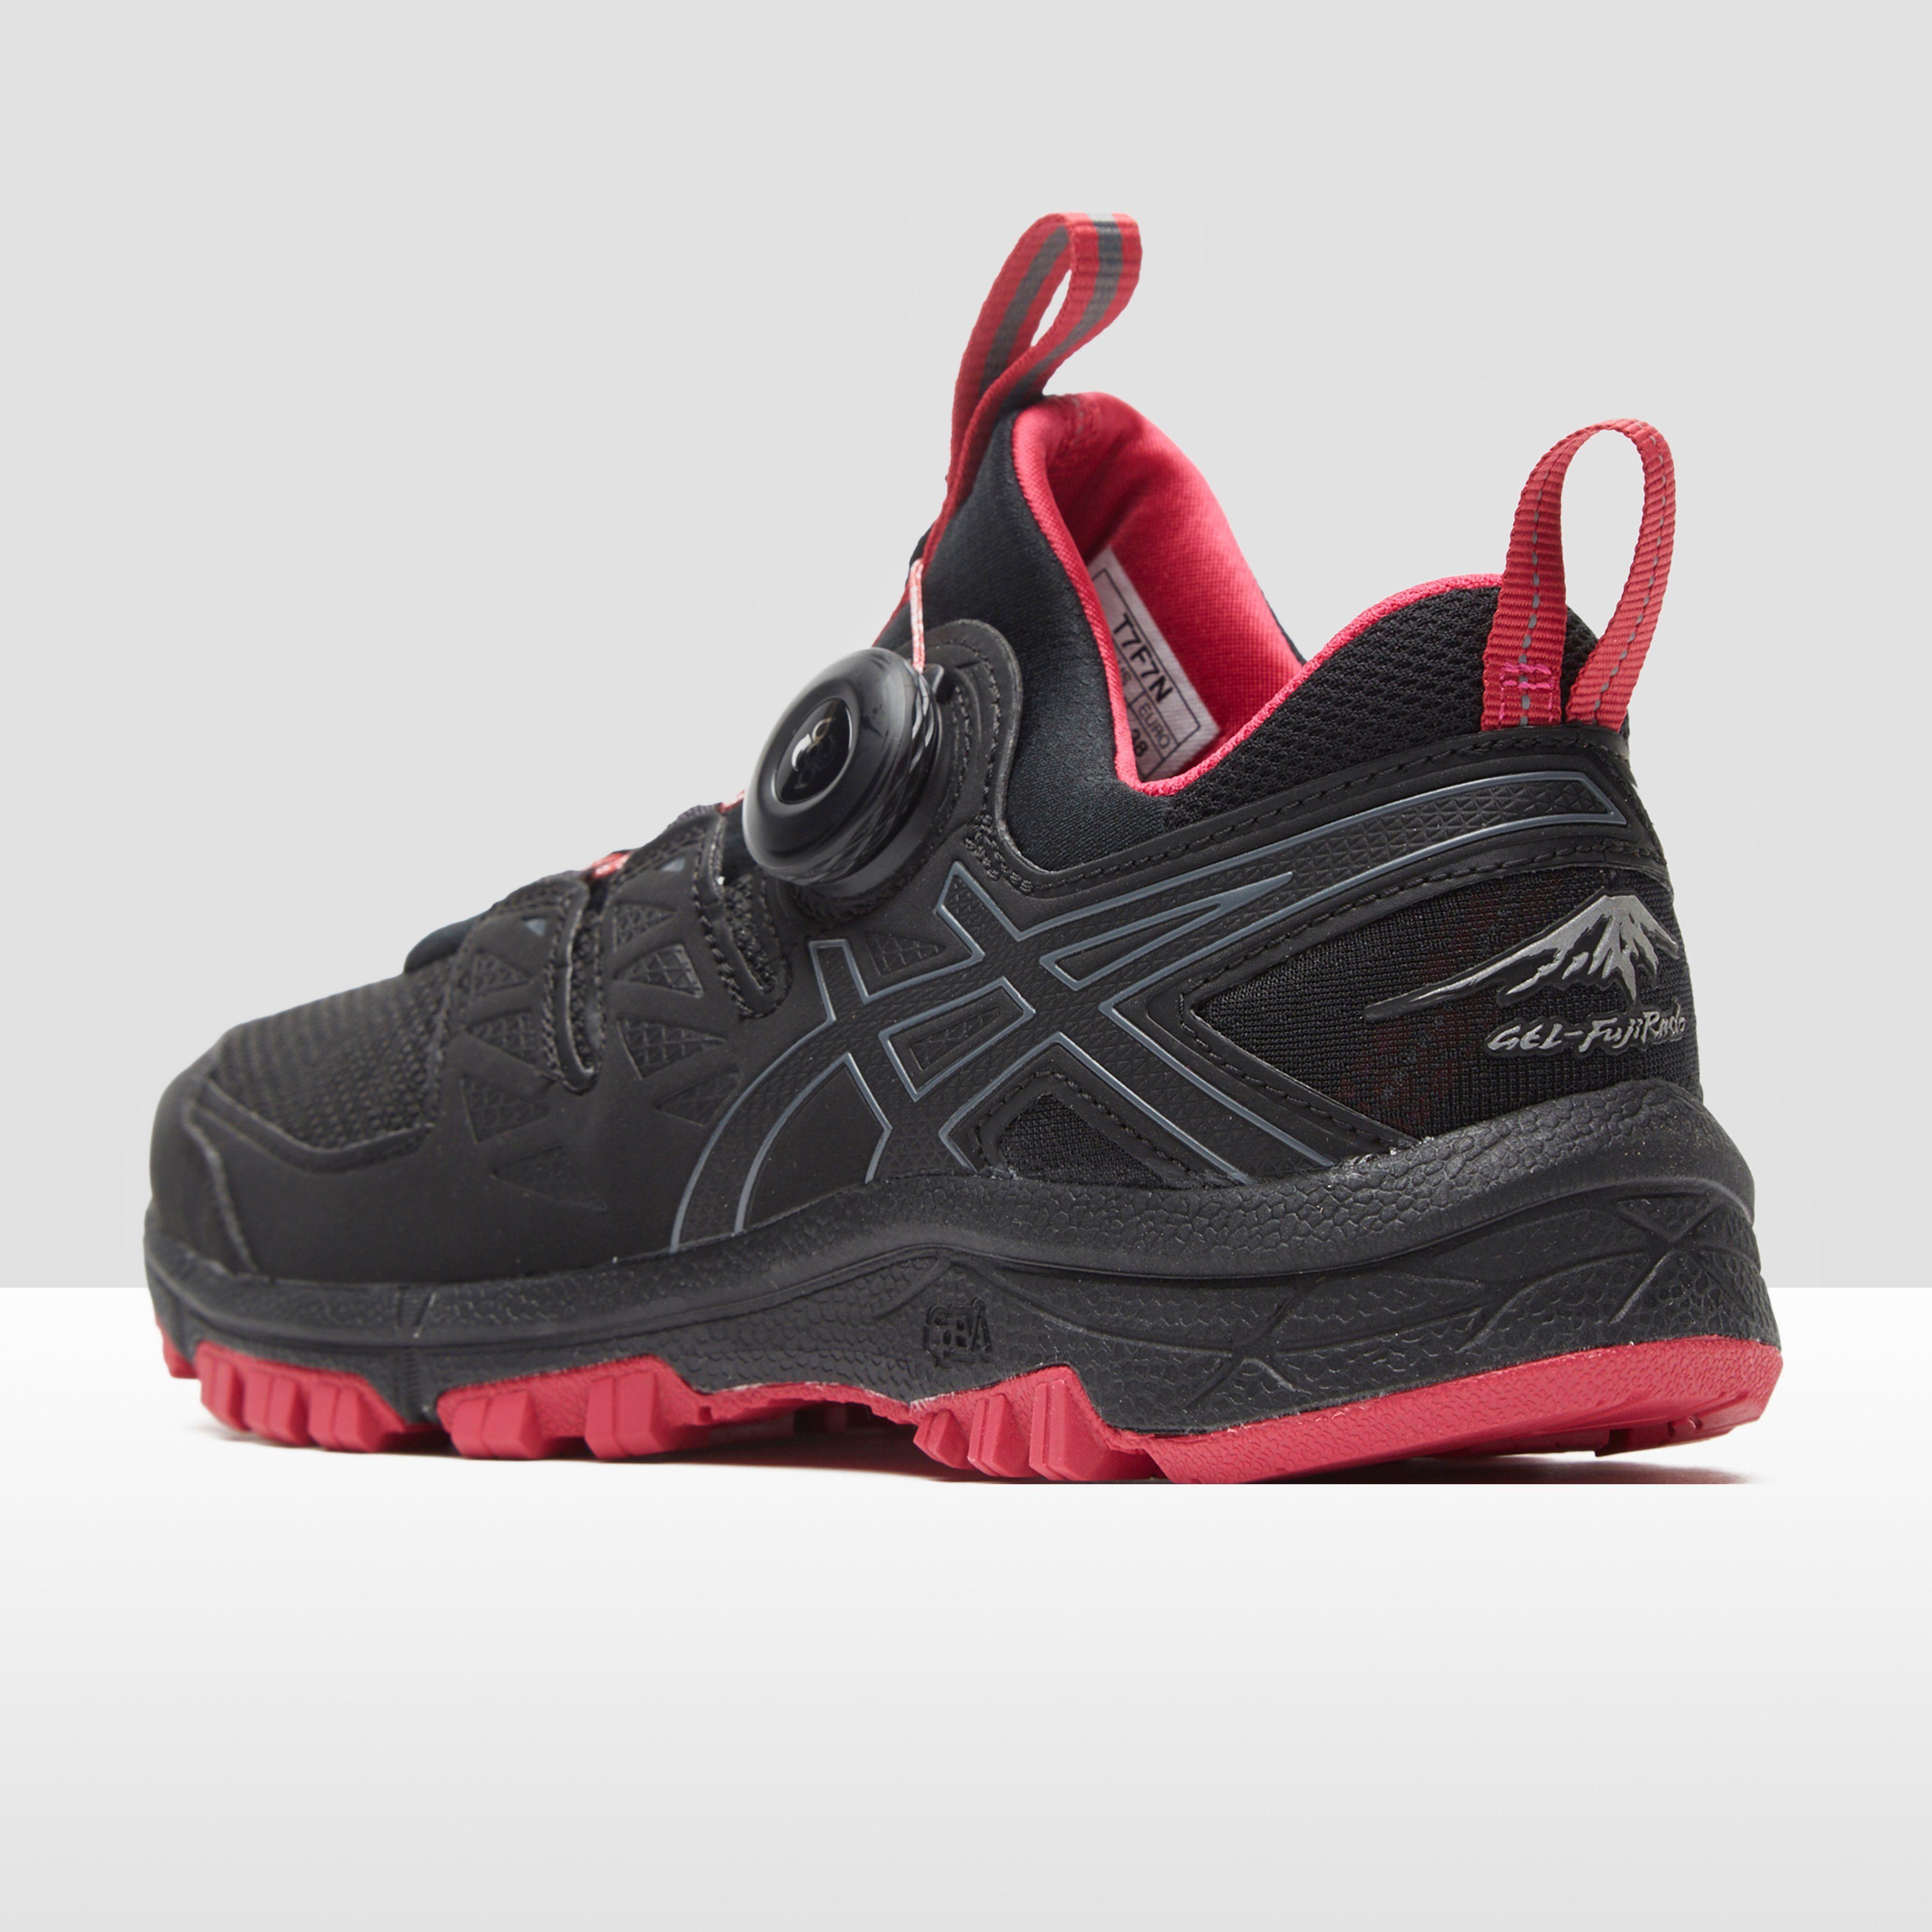 ASICS GEL-FujiRado Women's Trail Running Shoes